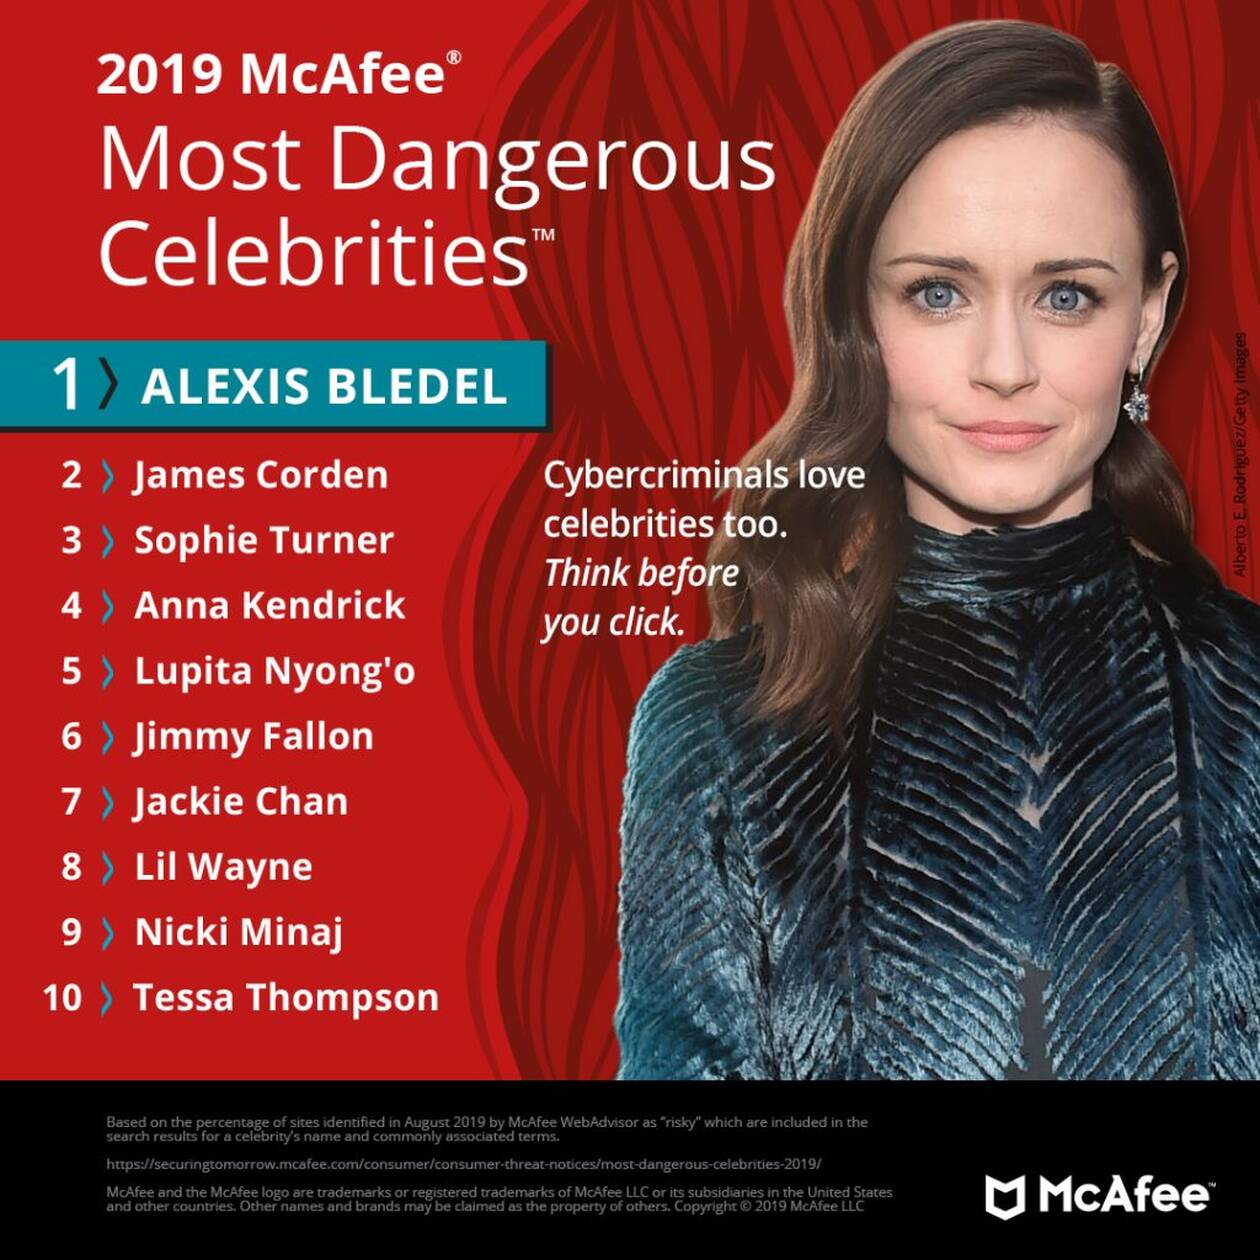 MDC-2019_Infographic_1080X1080_EN-US_Alexis_fnl-1-1024x1024.jpg